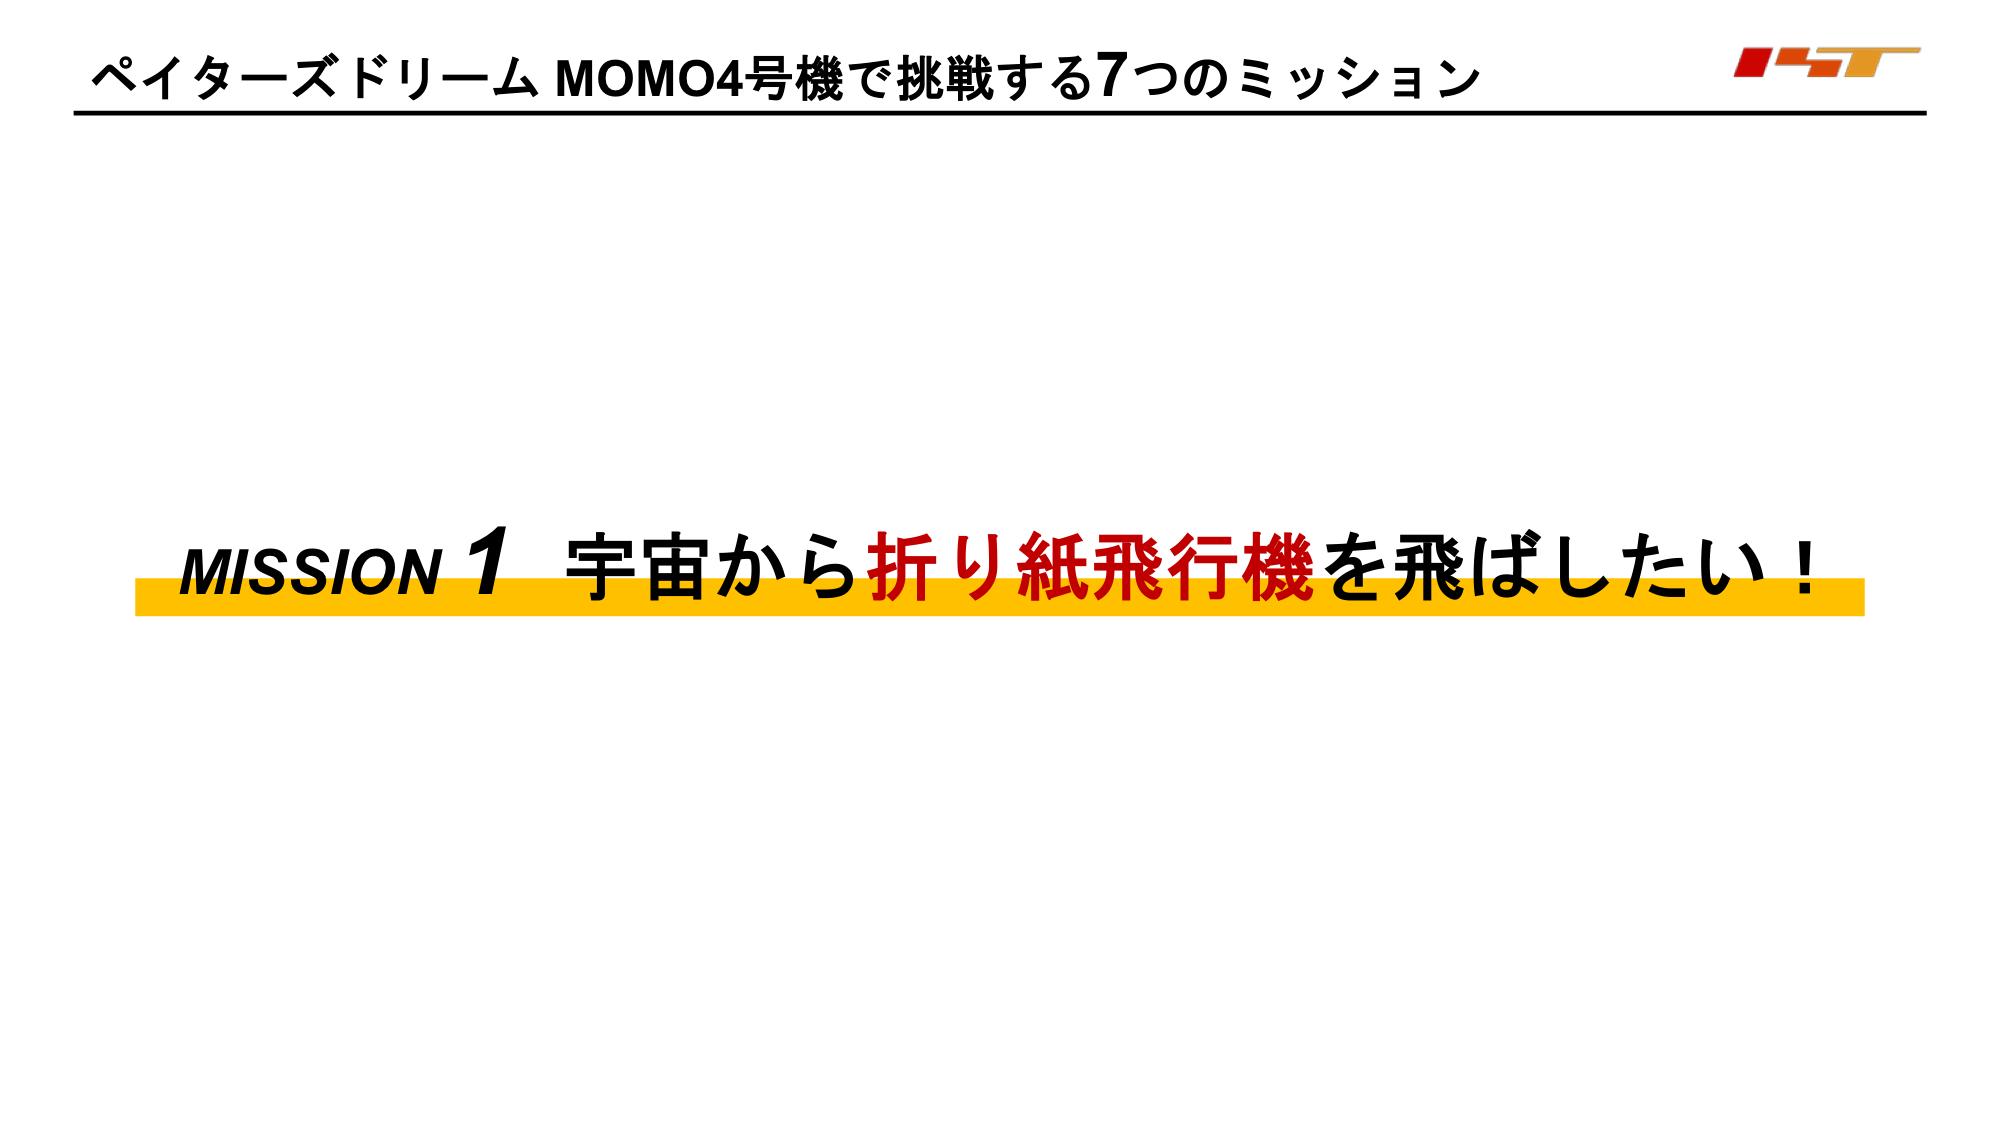 f:id:Imamura:20190628161141p:plain